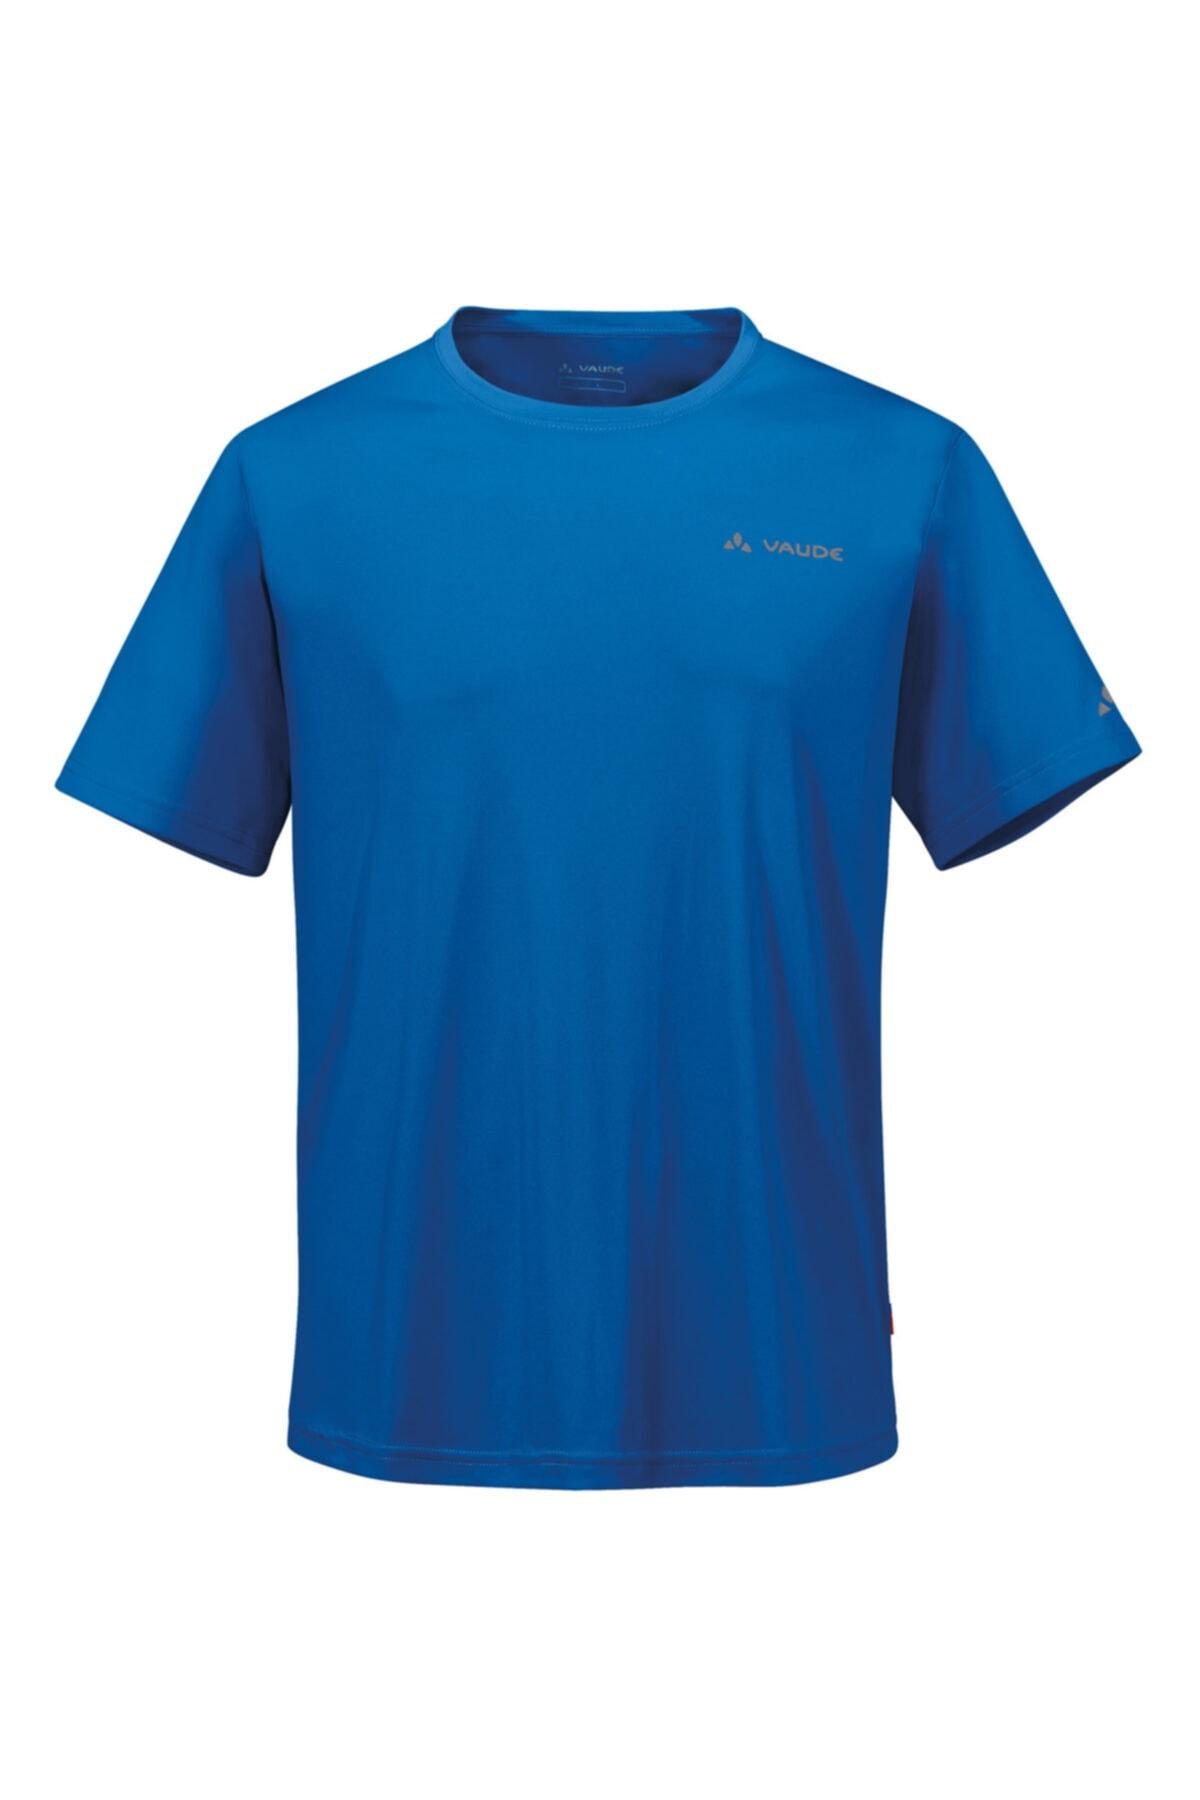 VAUDE Scopi Erkek T-shirt 40423 1